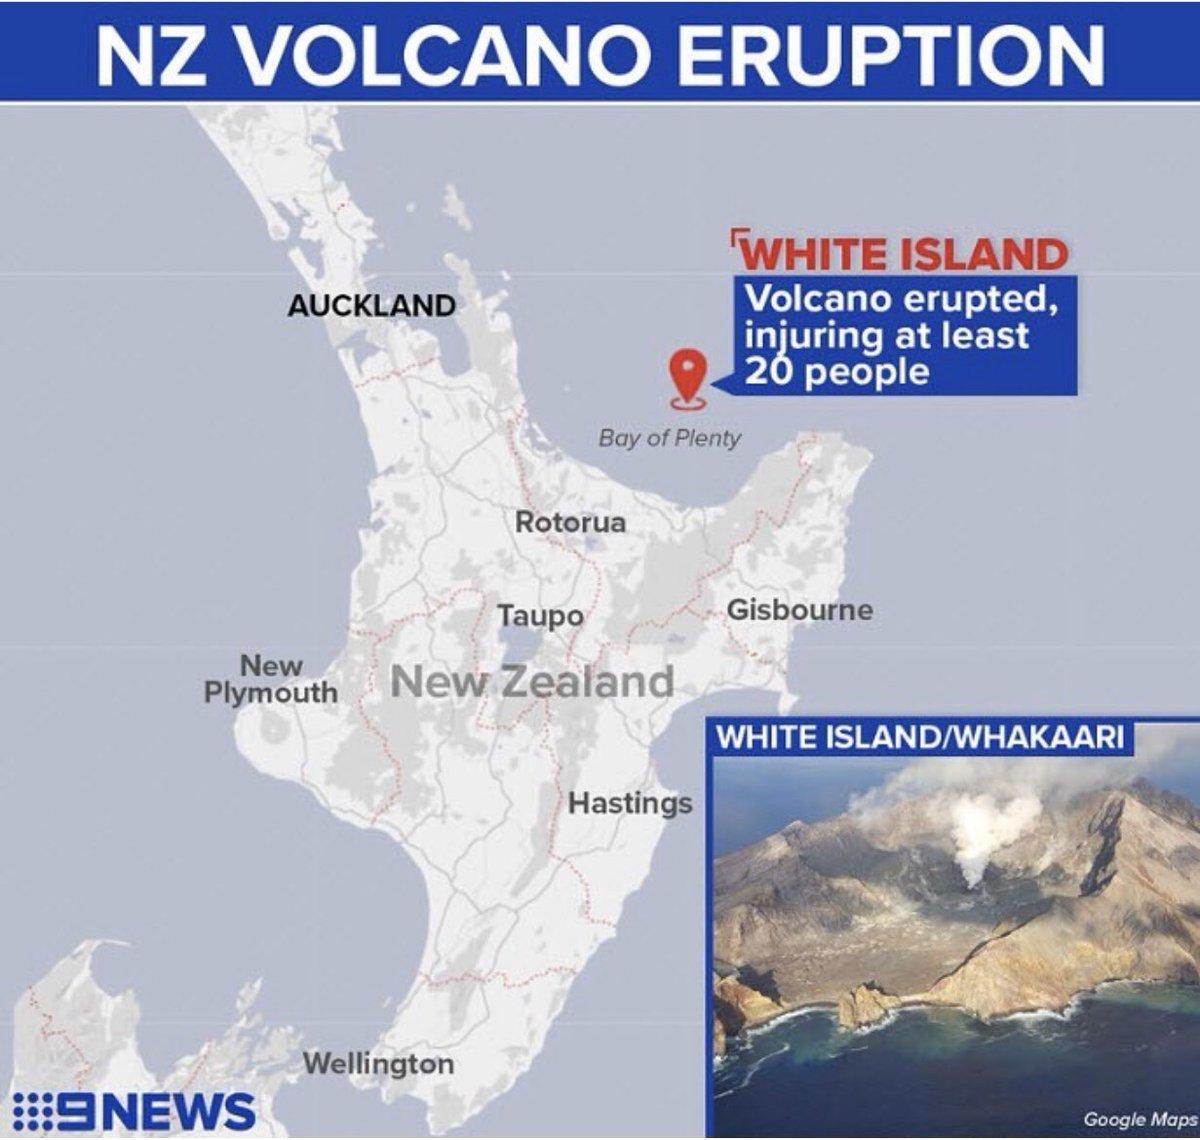 So sad #NewZealand #WhiteIsland #eruption